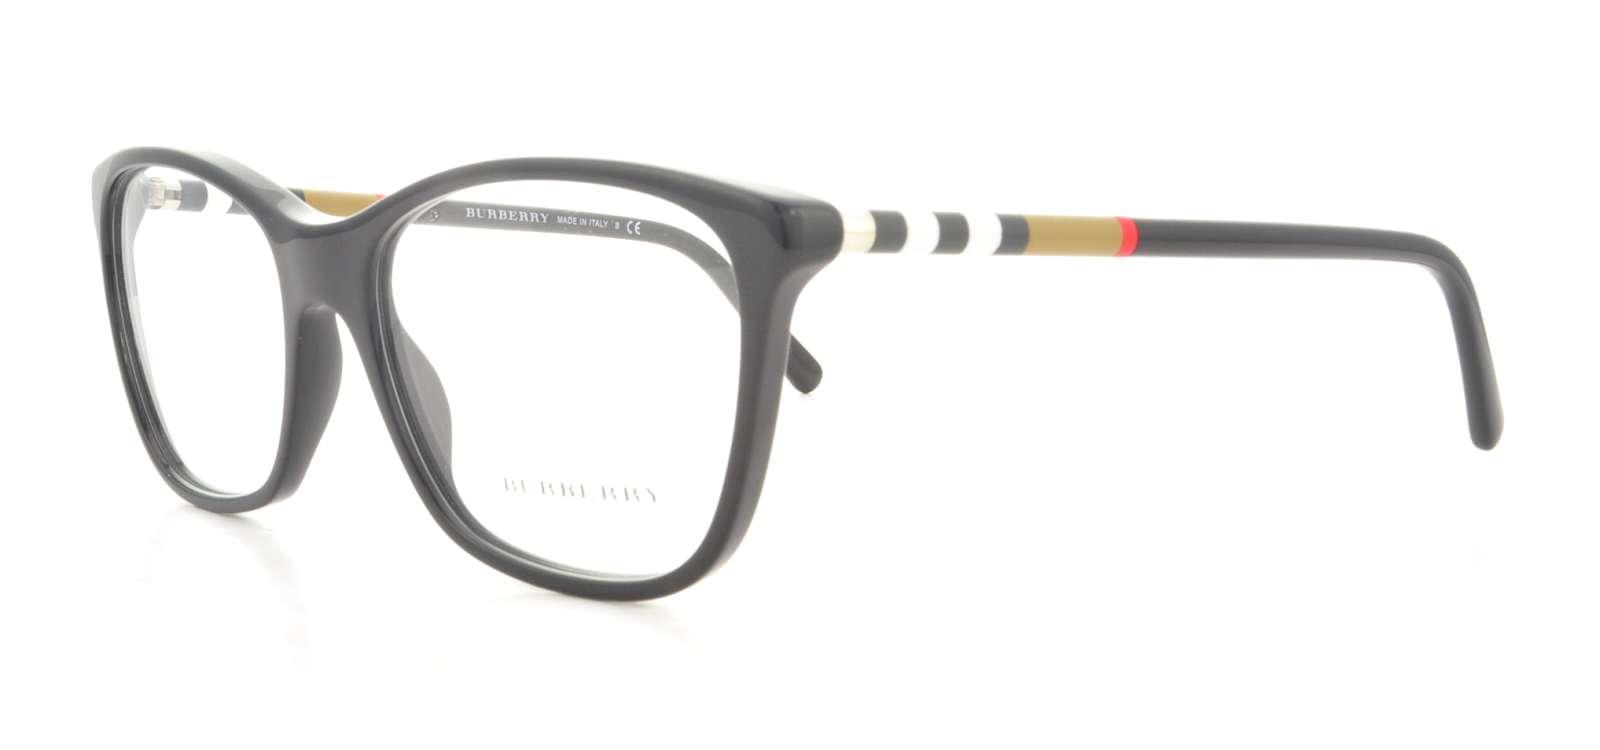 1ac5bf8044a8 Designer Frames Outlet. Burberry BE2141 Mens Burberry Glasses